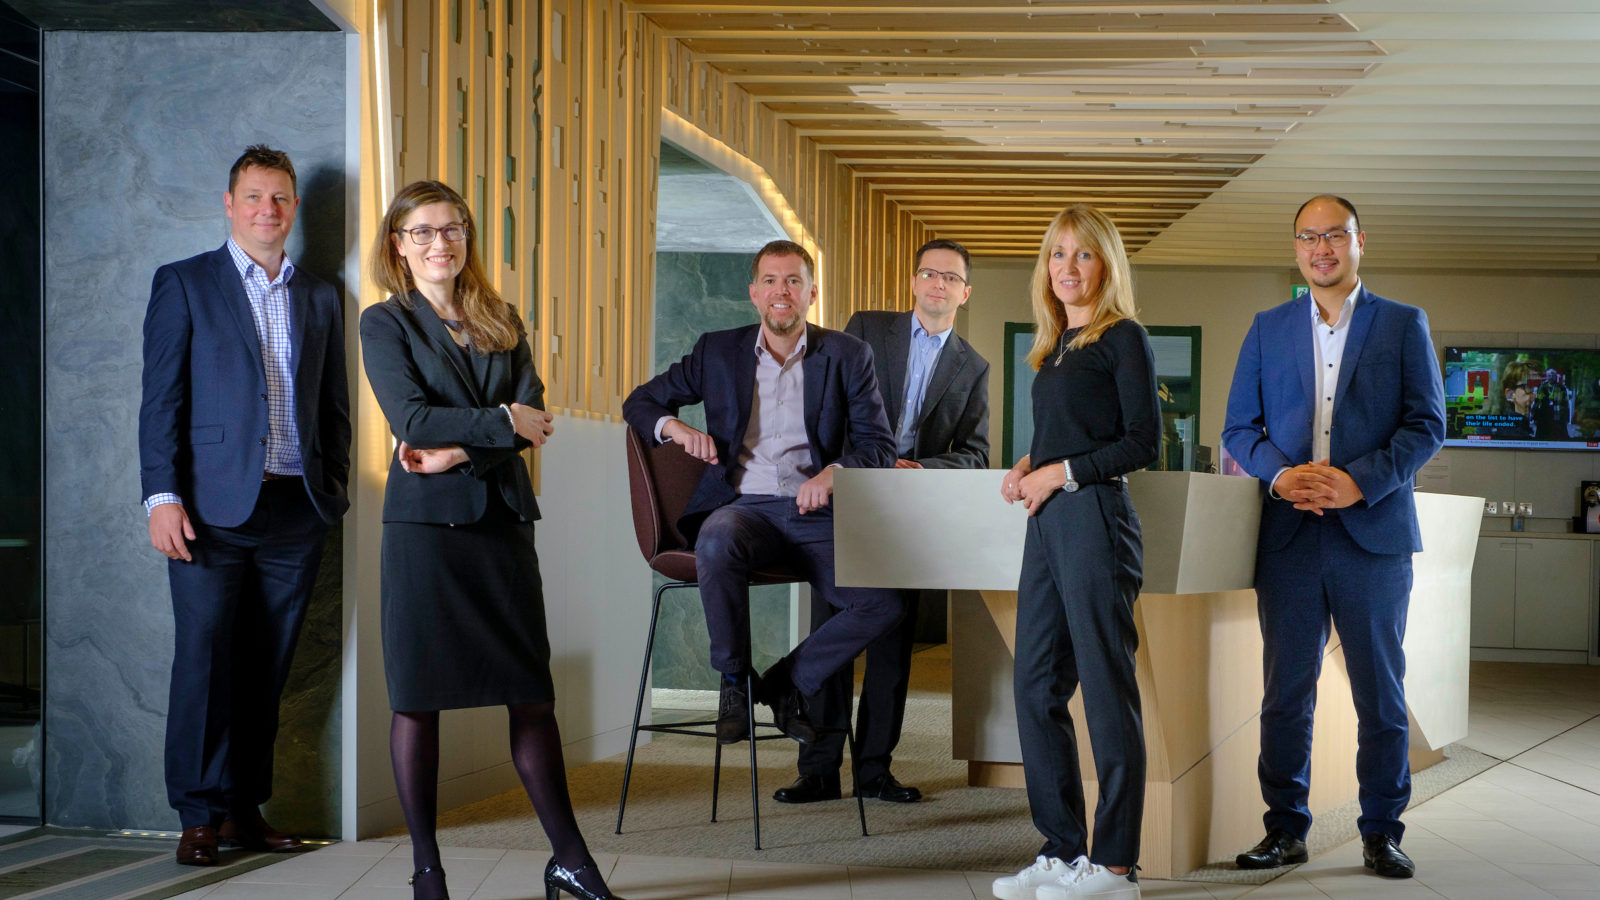 New KPMG directors from left to right James Lucas Catriona Donald Steven Lindsay Gordon Gray Susan Thom Harvard Lee